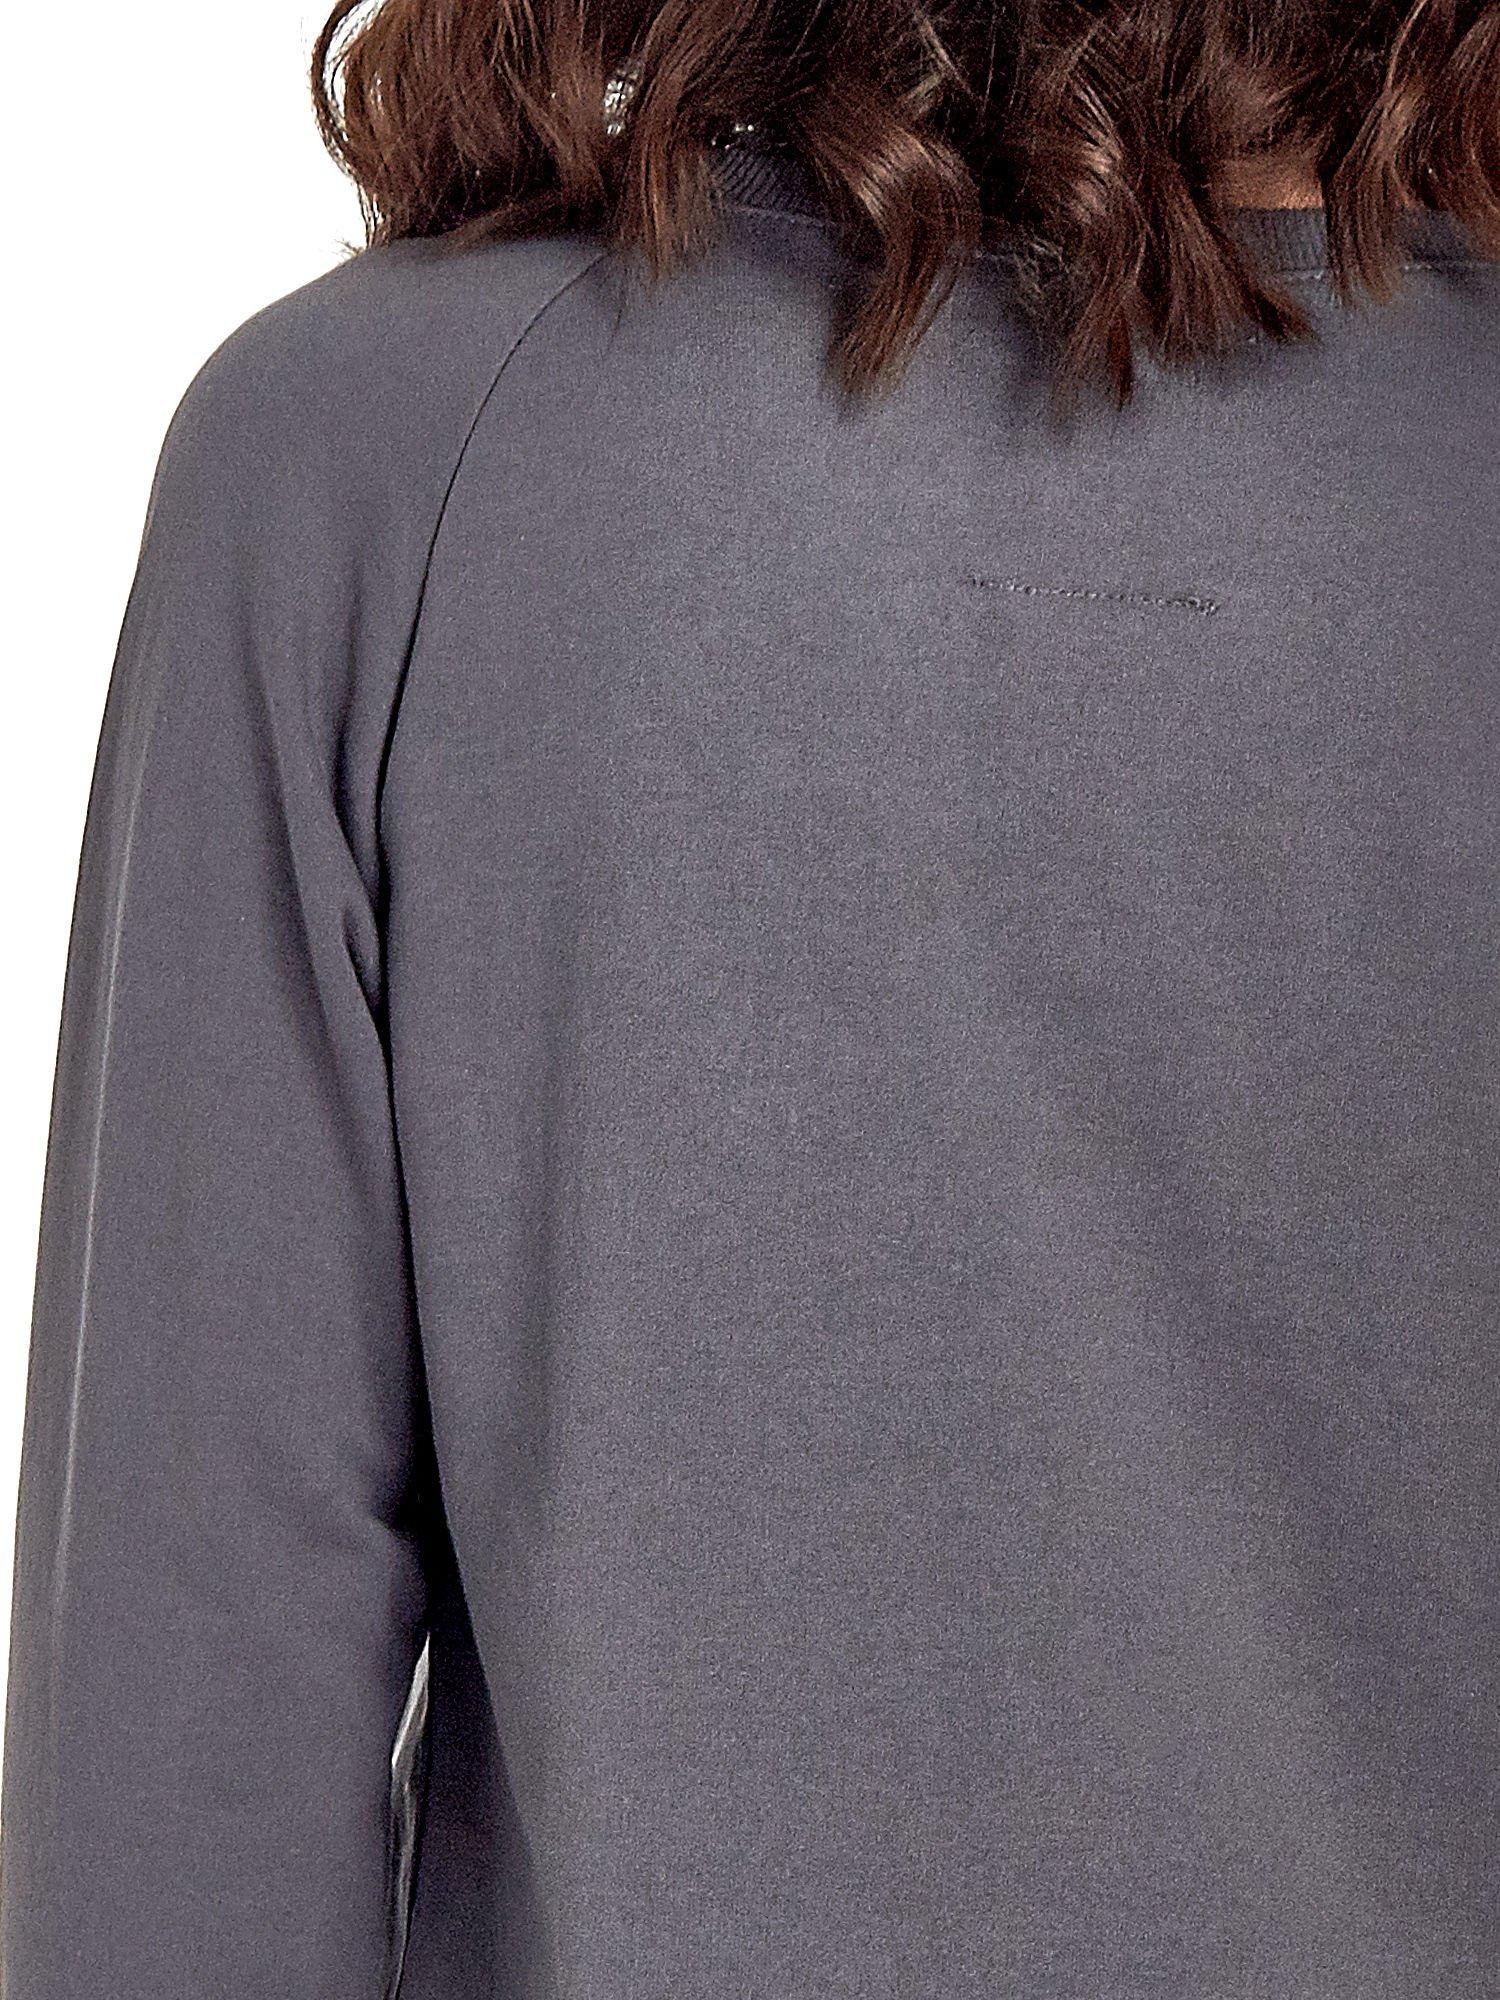 Ciemnoszara klasyczna bluza damska z napisem WORK OUT                                  zdj.                                  7